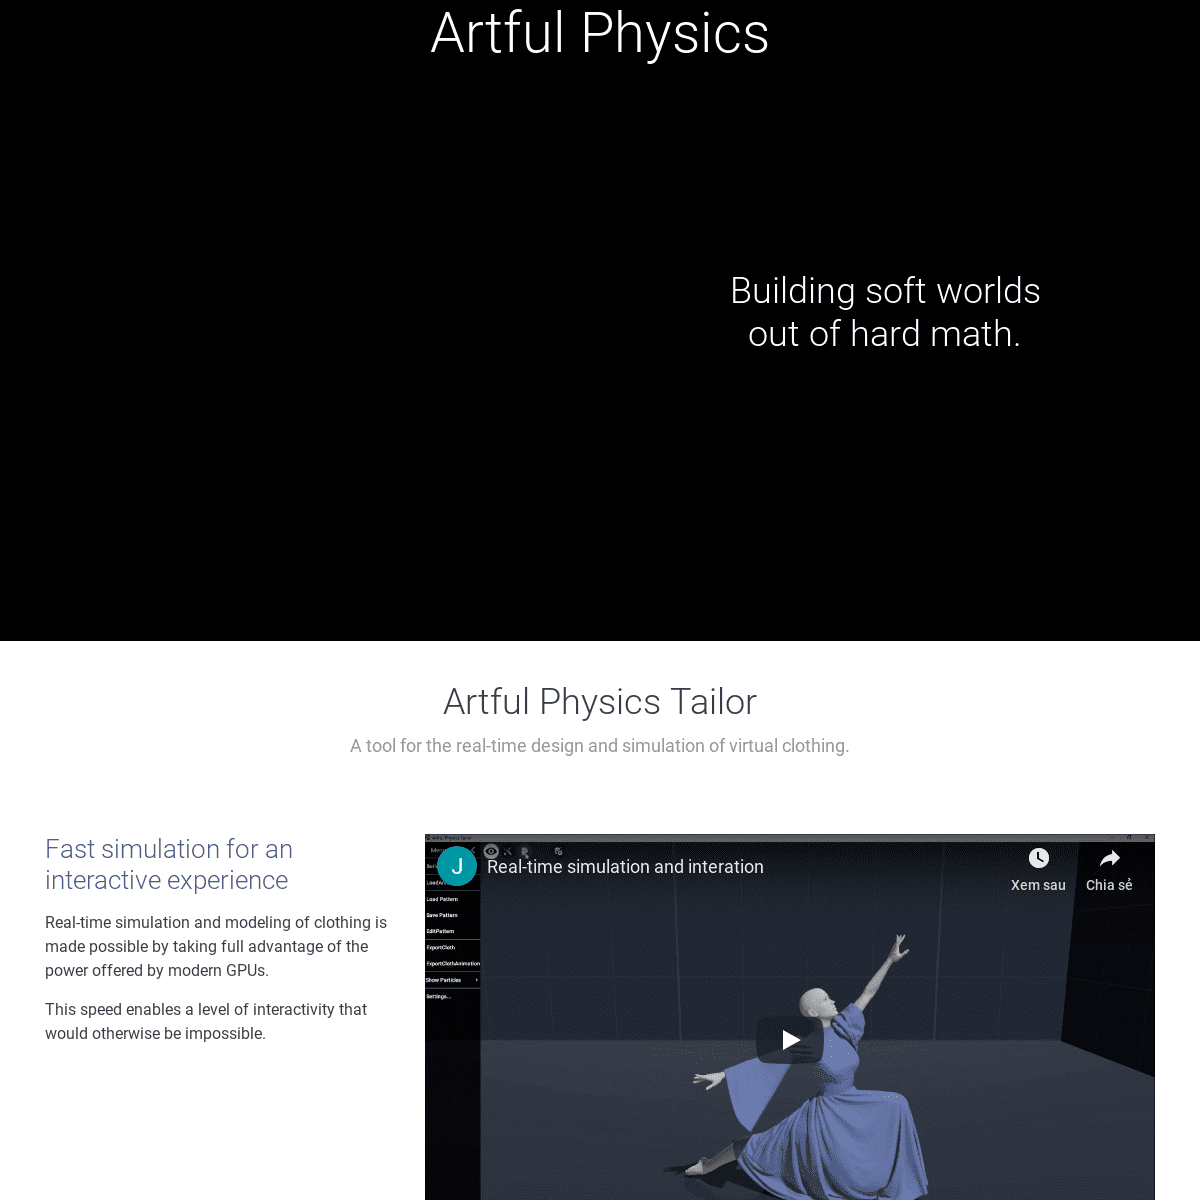 Artful Physics